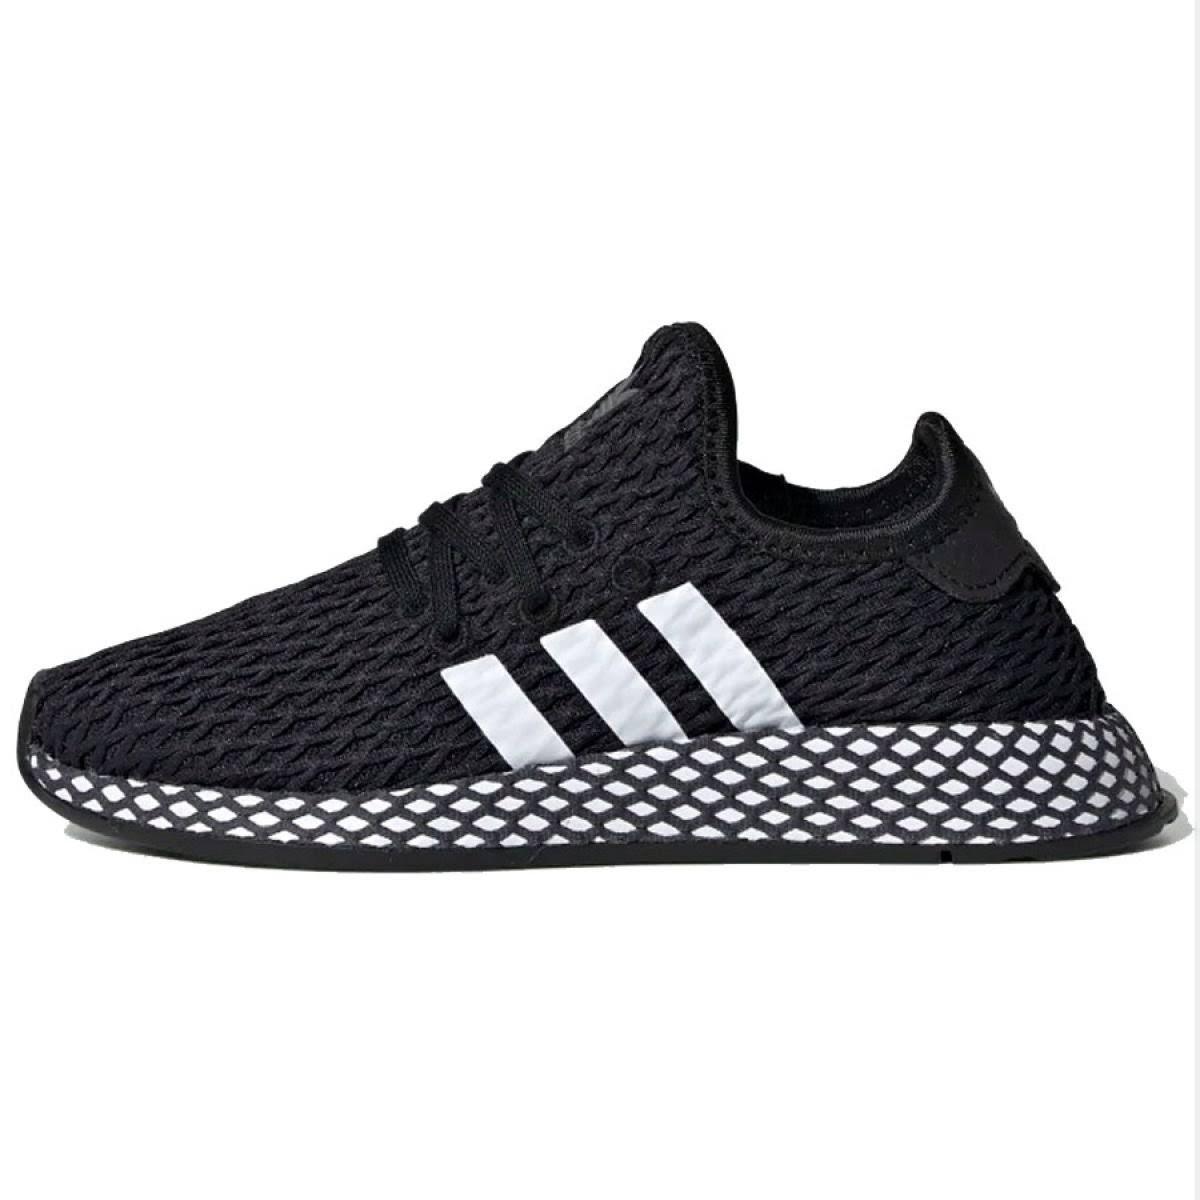 Adidas Deerupt Runner Shoes - Black - Kids